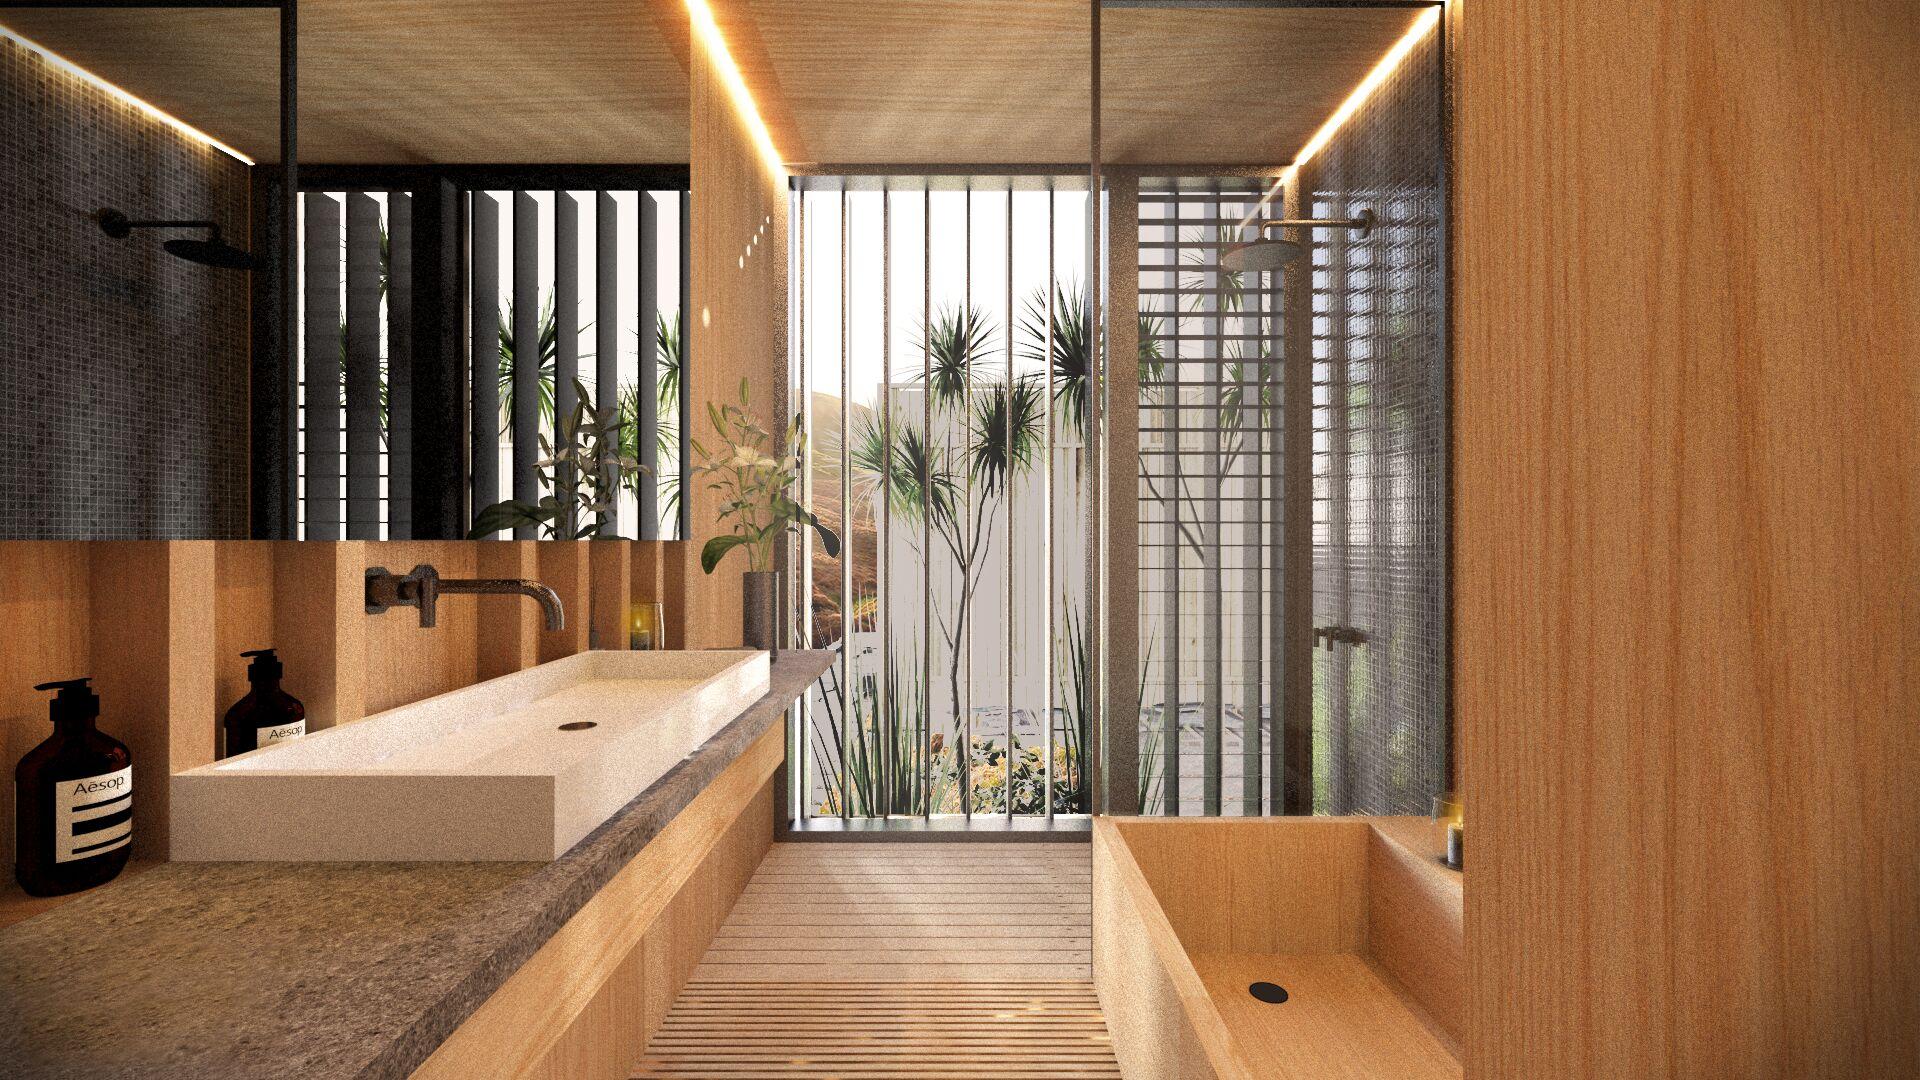 Atelier Aitken Timber bathroom Breamtail.jpeg